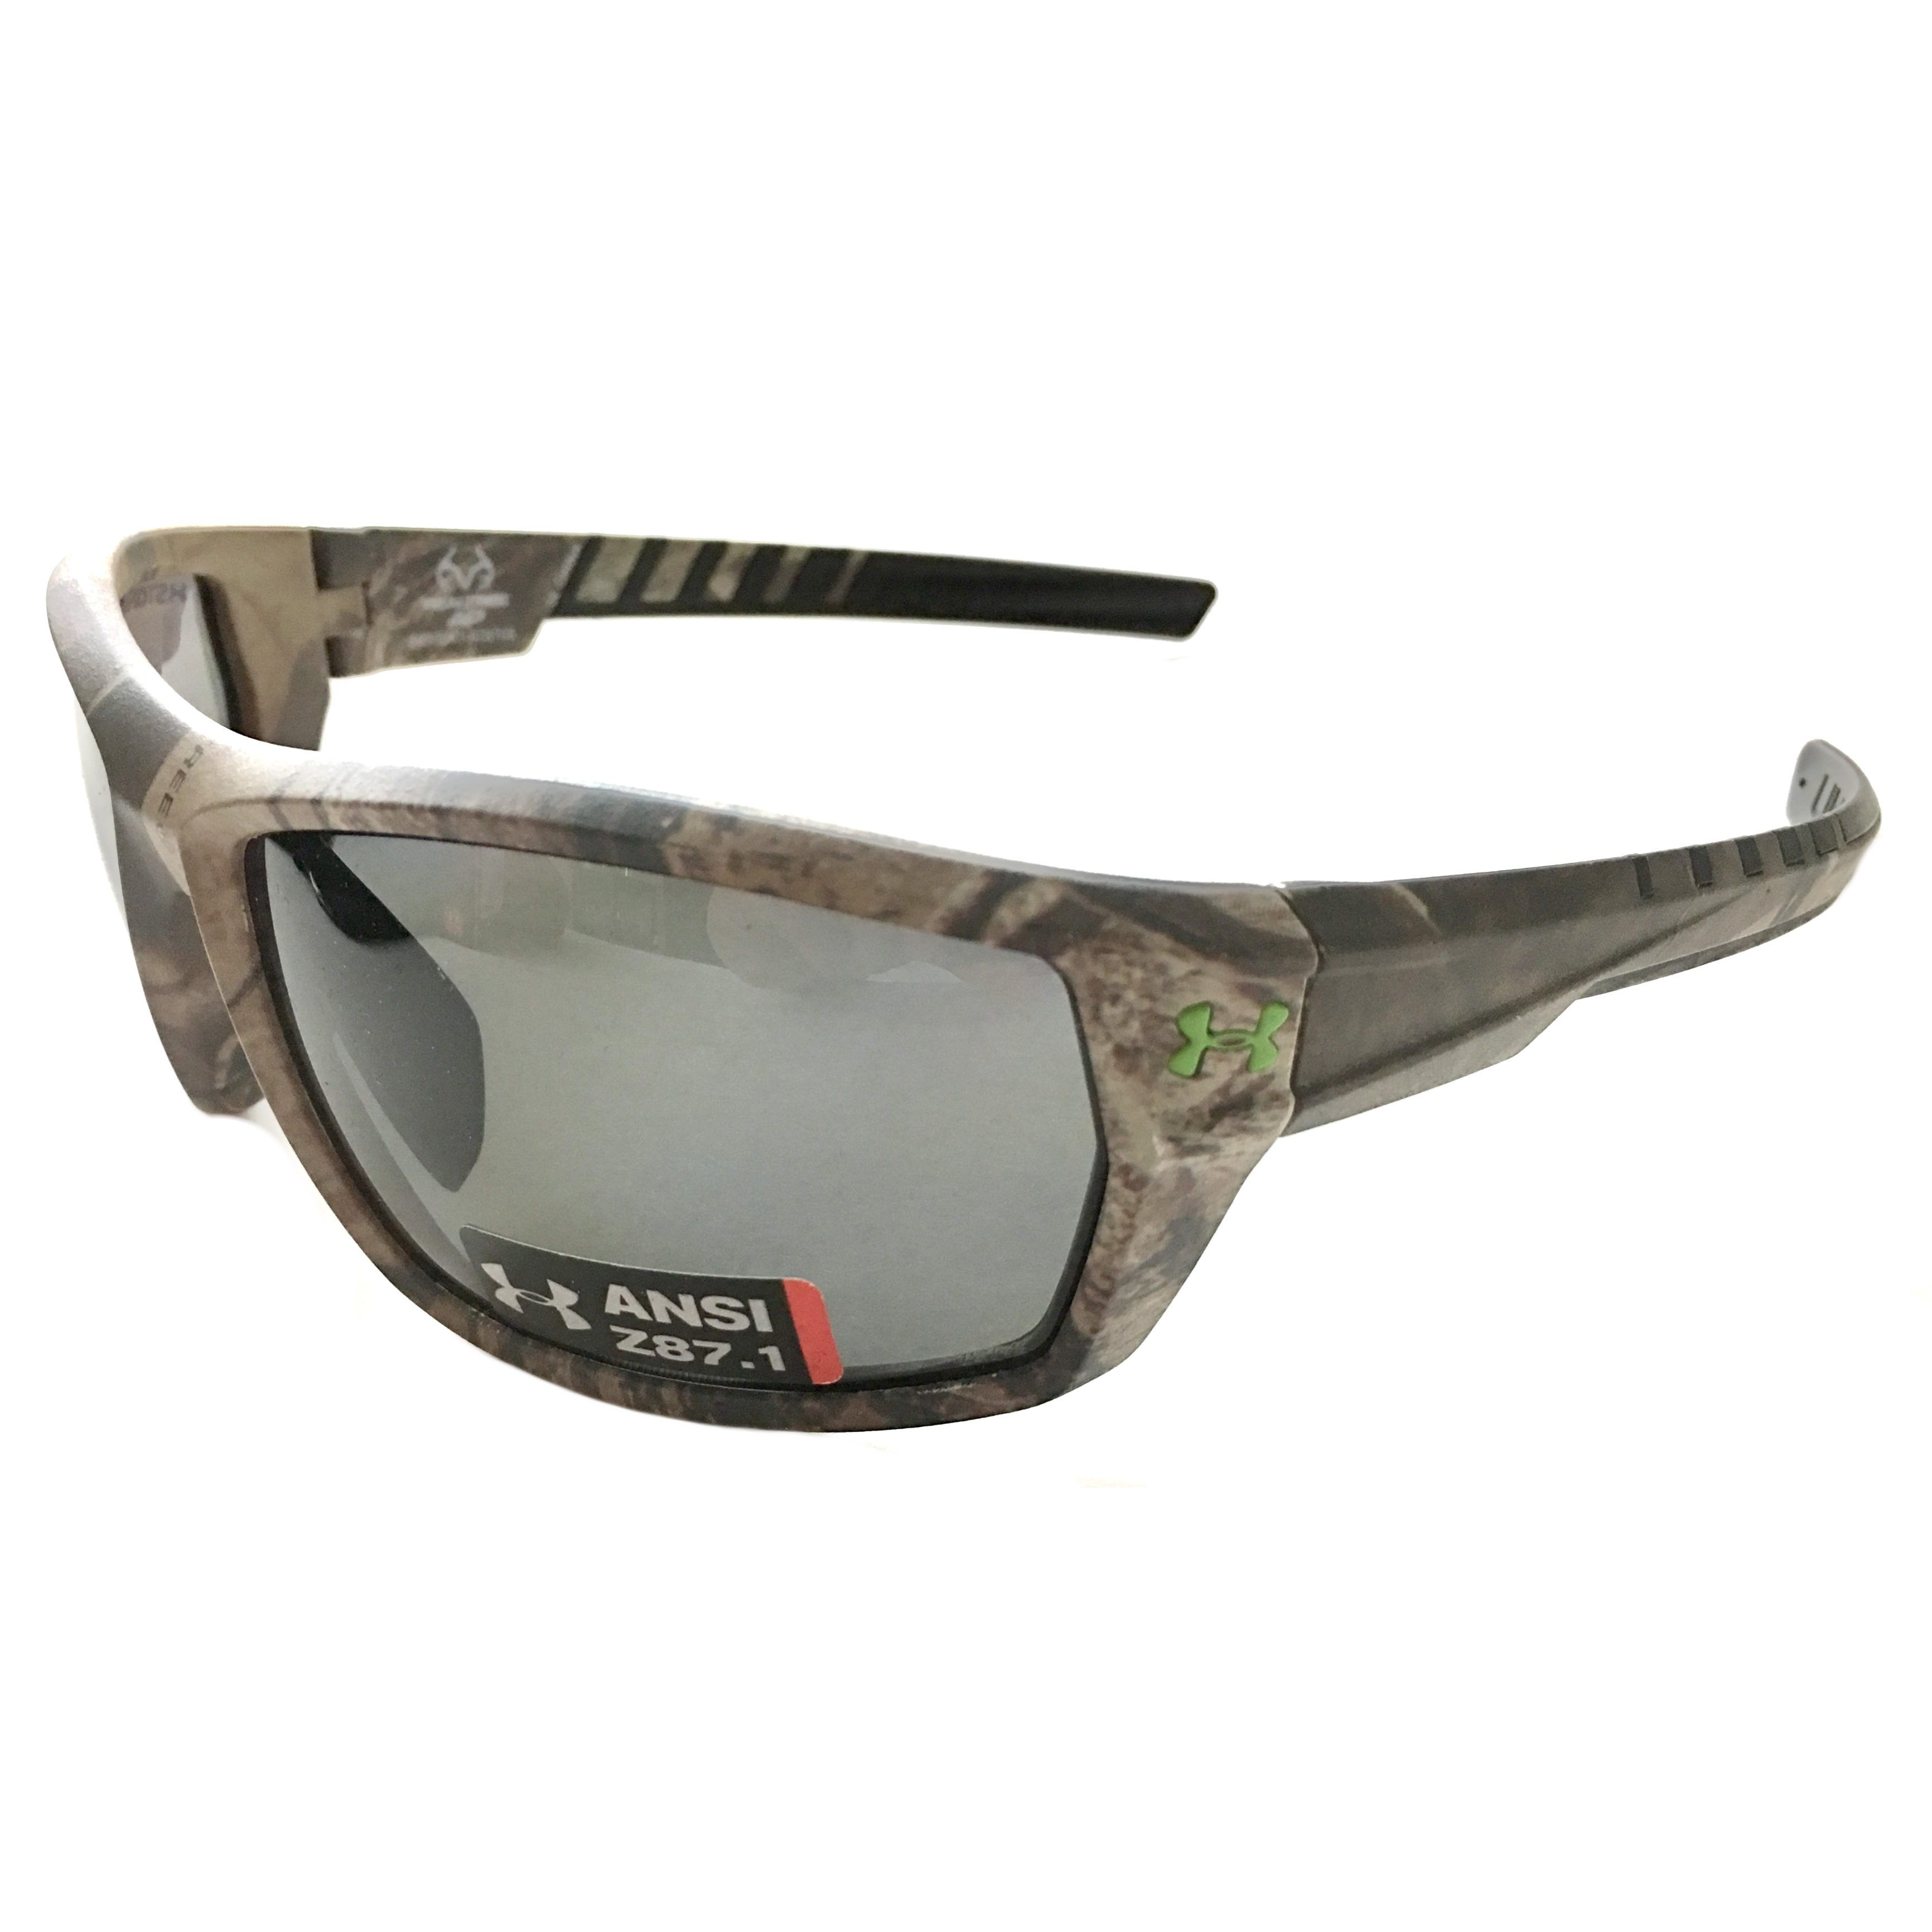 c729f1e5d3b0a Under Armour Ranger Sunglasses – UA Satin Realtree Camo – Polarized Gray  Storm Lens